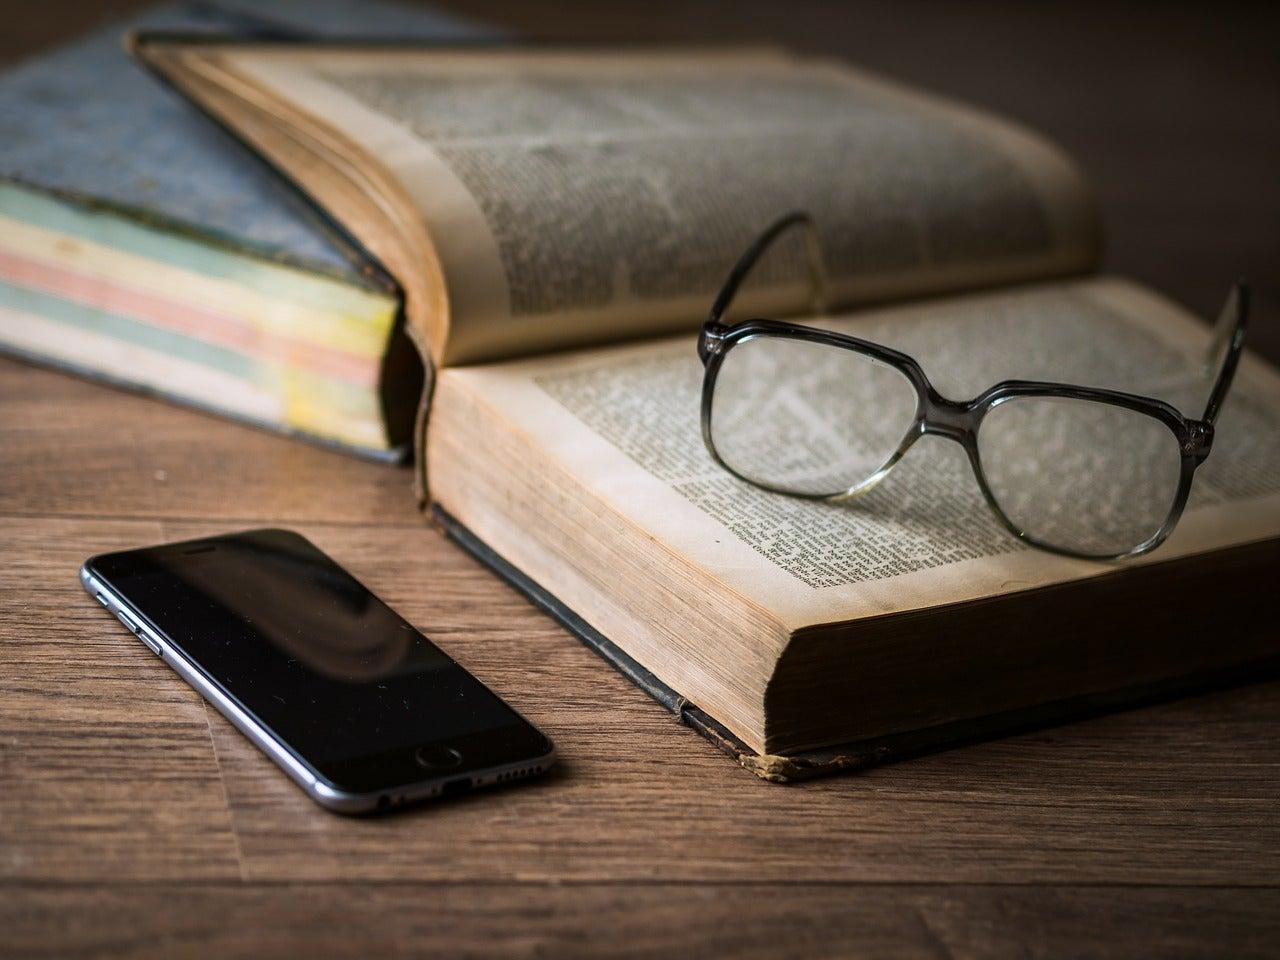 Paper book ereader smartphone